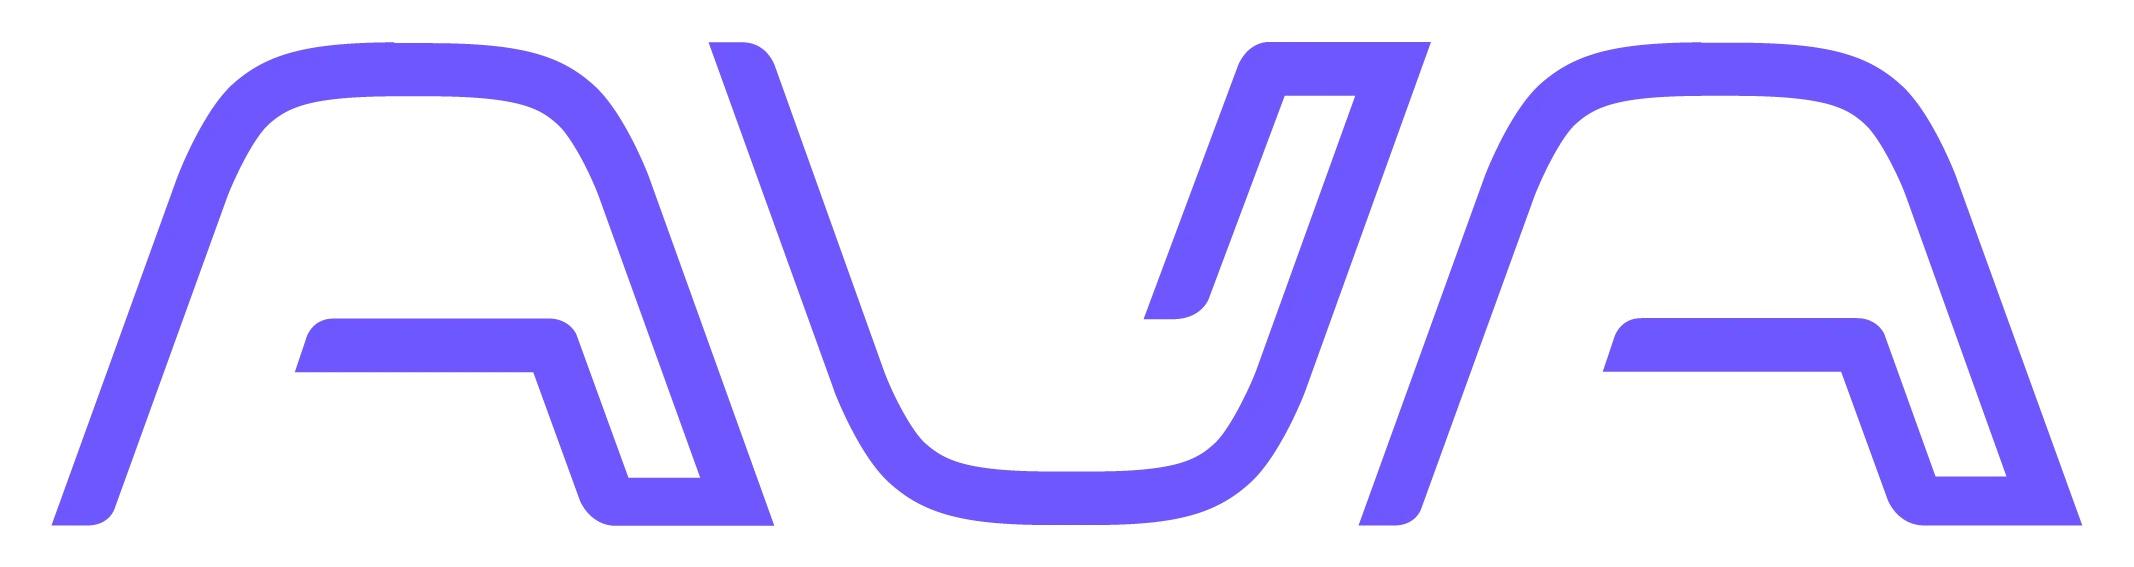 Ava Security logo